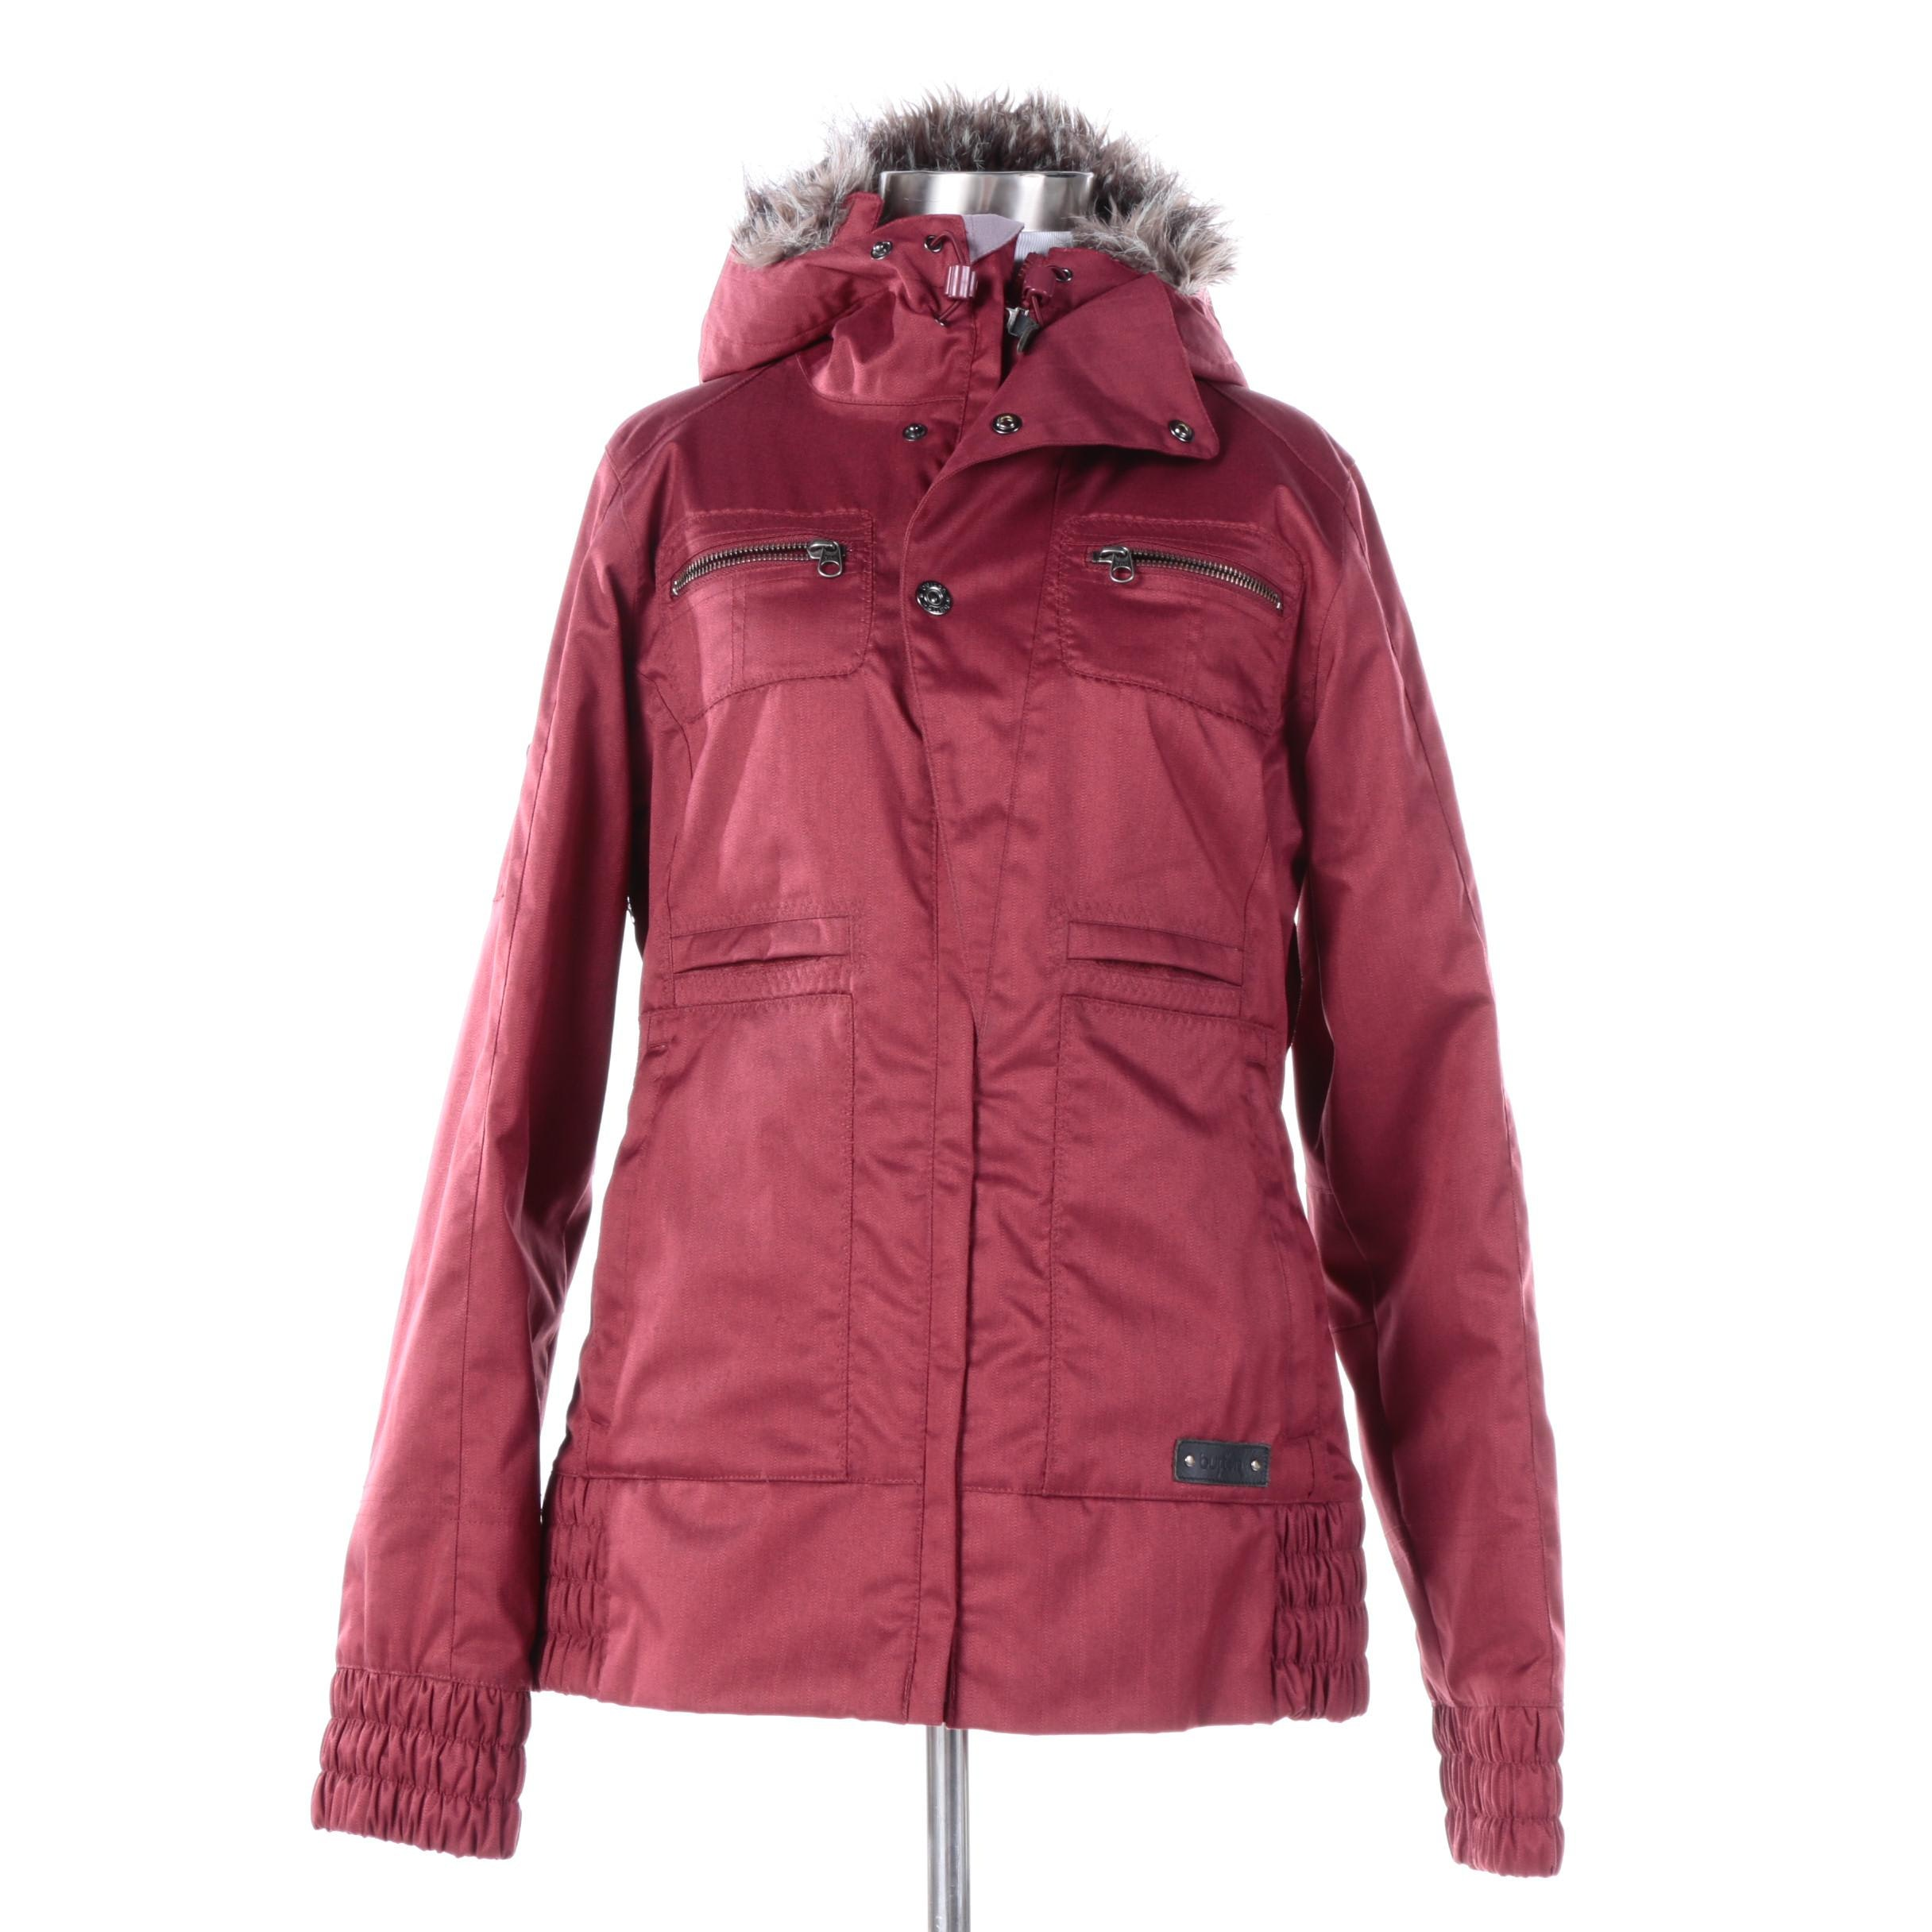 Women's Burton Snowboard Coat with Faux Fur Trim